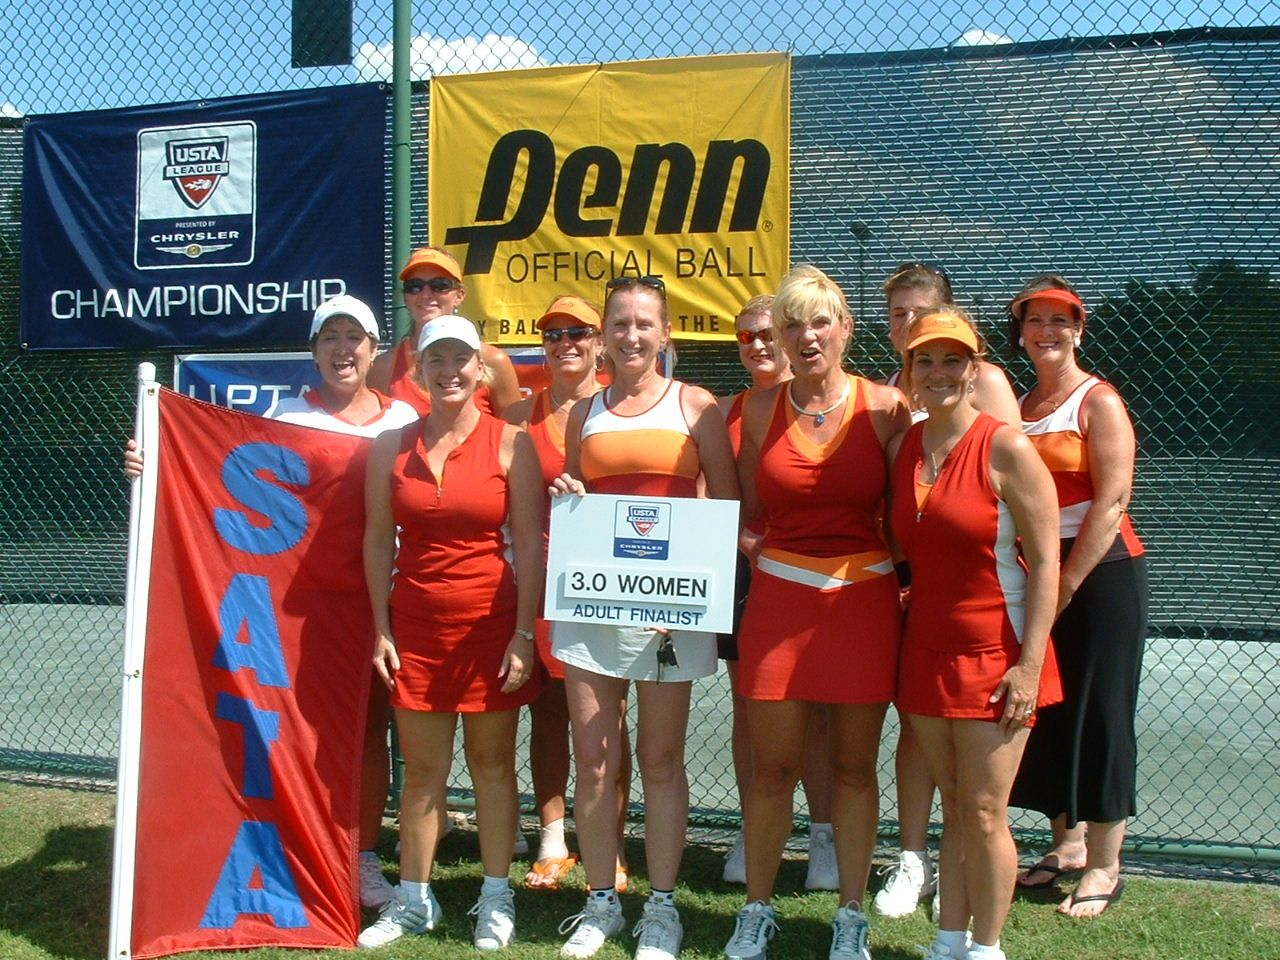 2007 Adult Champs 3.0 W Finalist